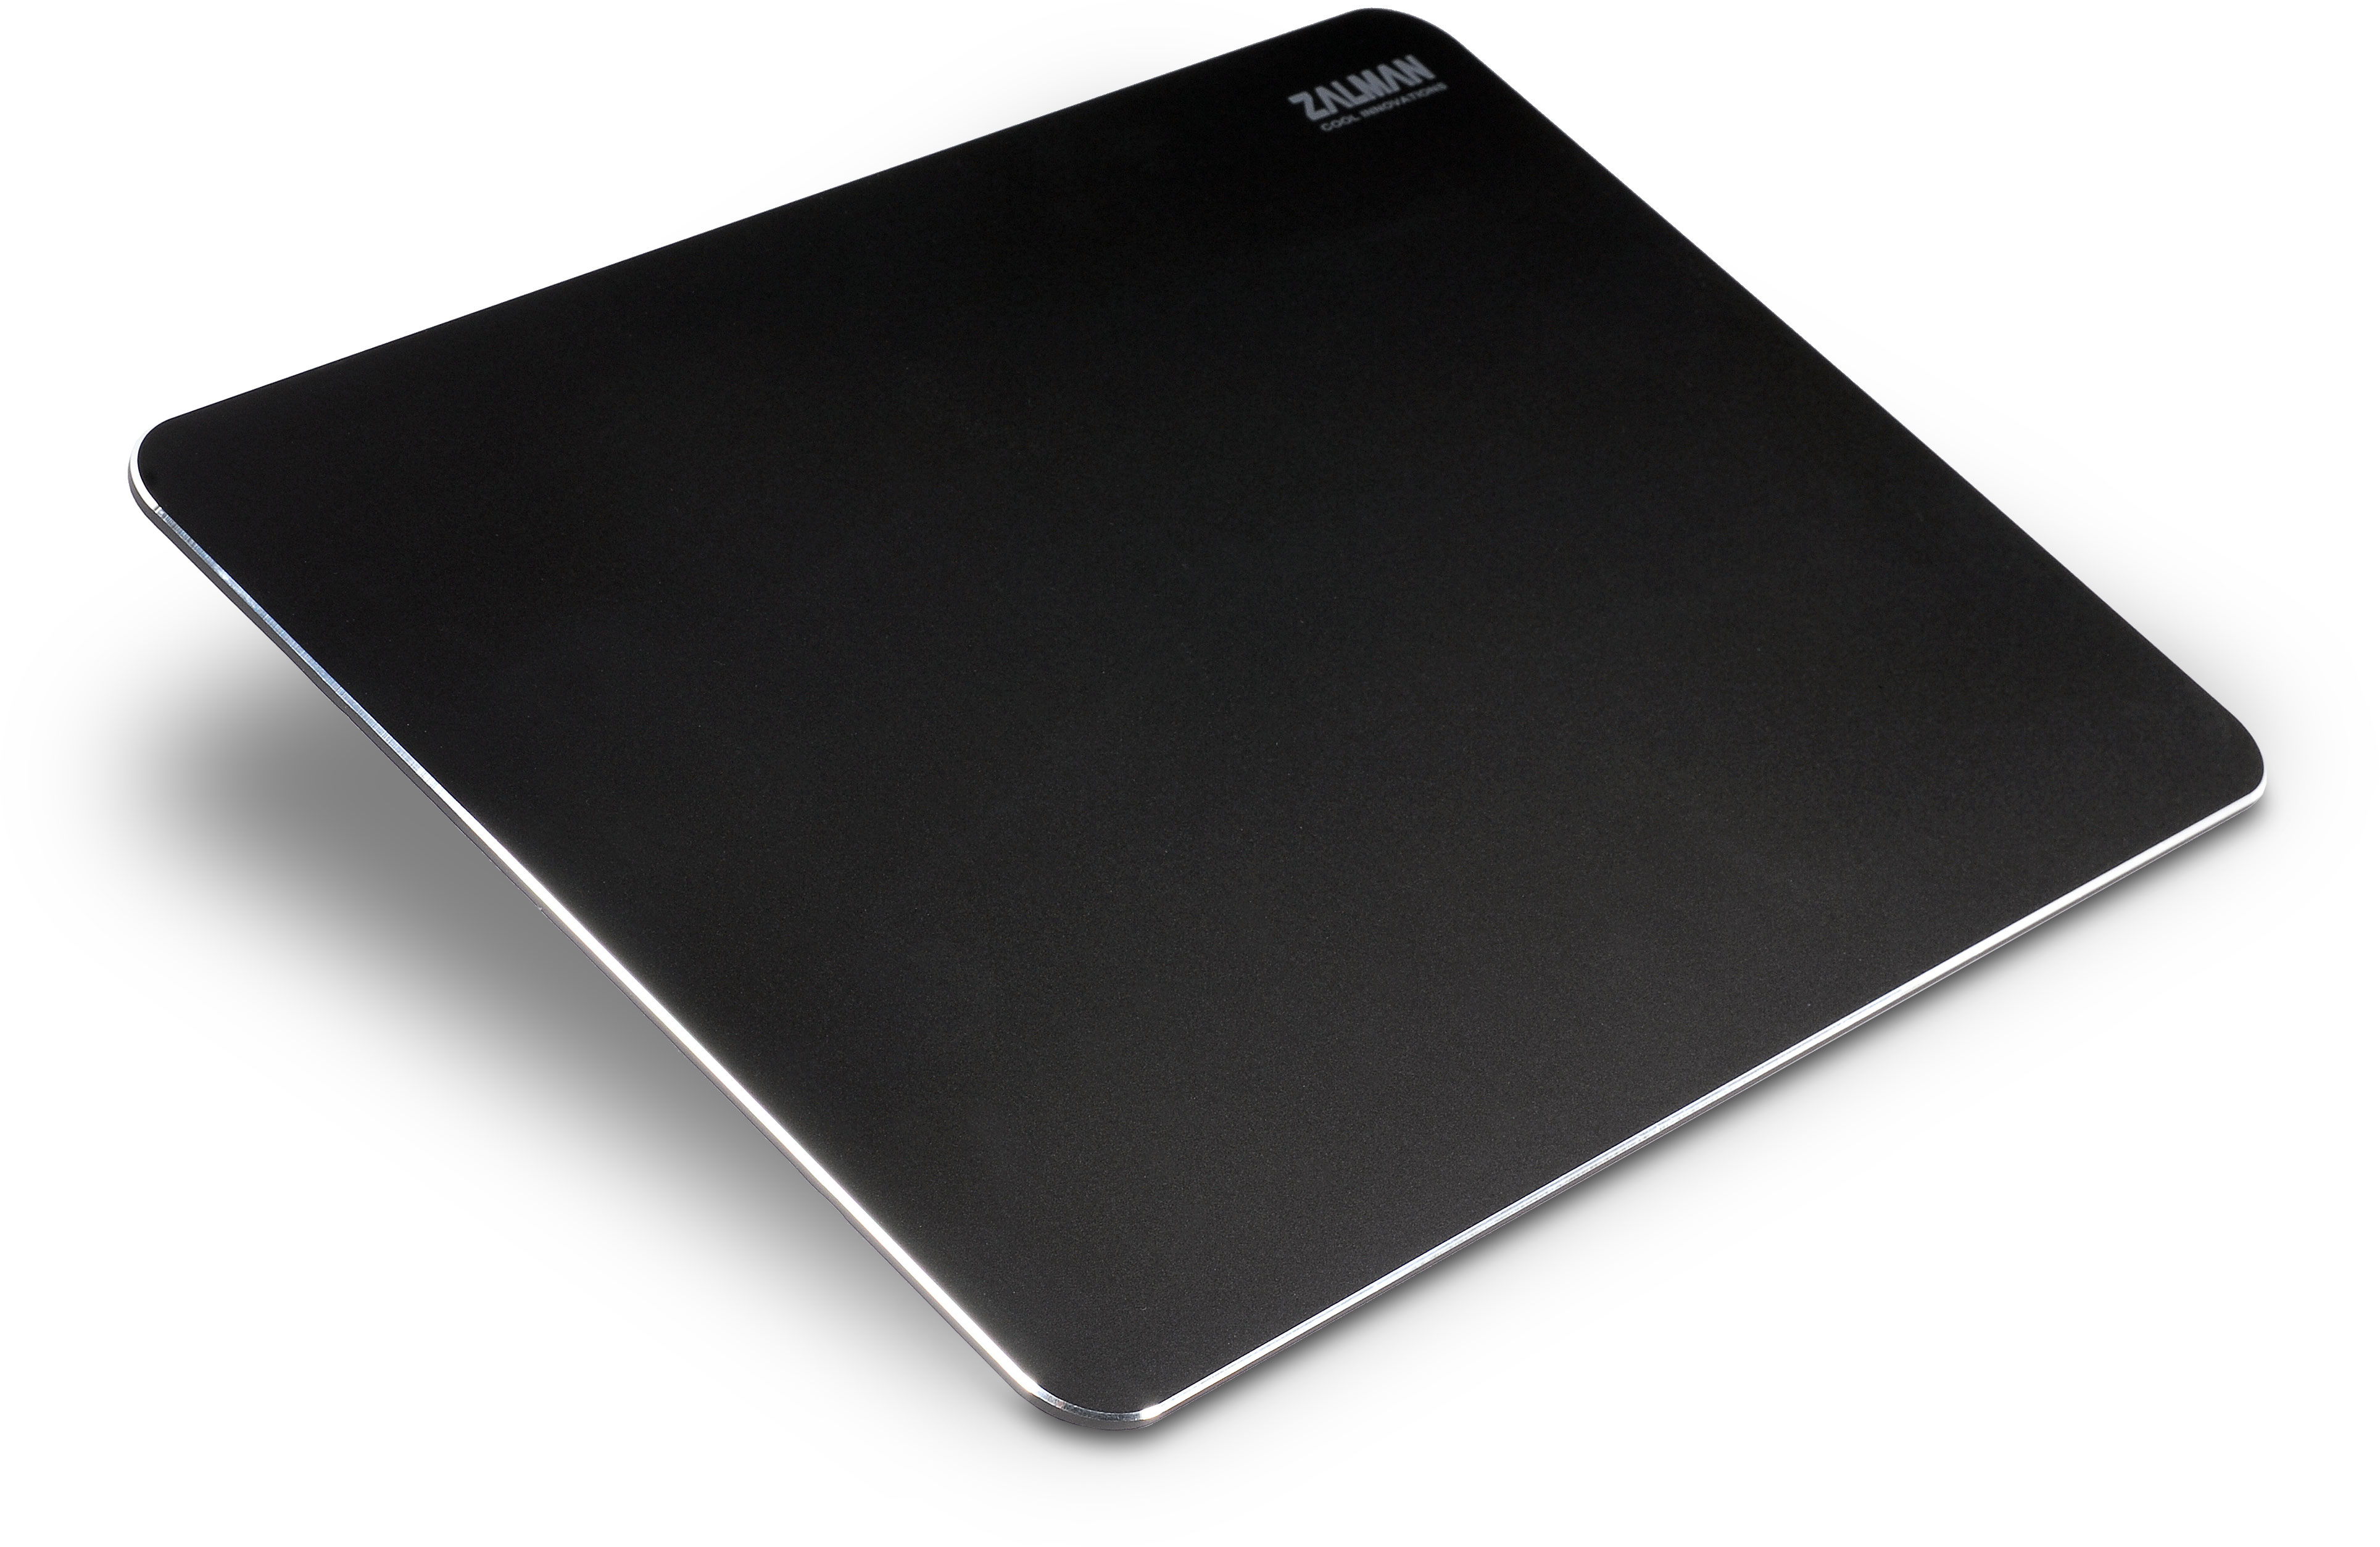 Amp1000 Aluminium Mouse Pad